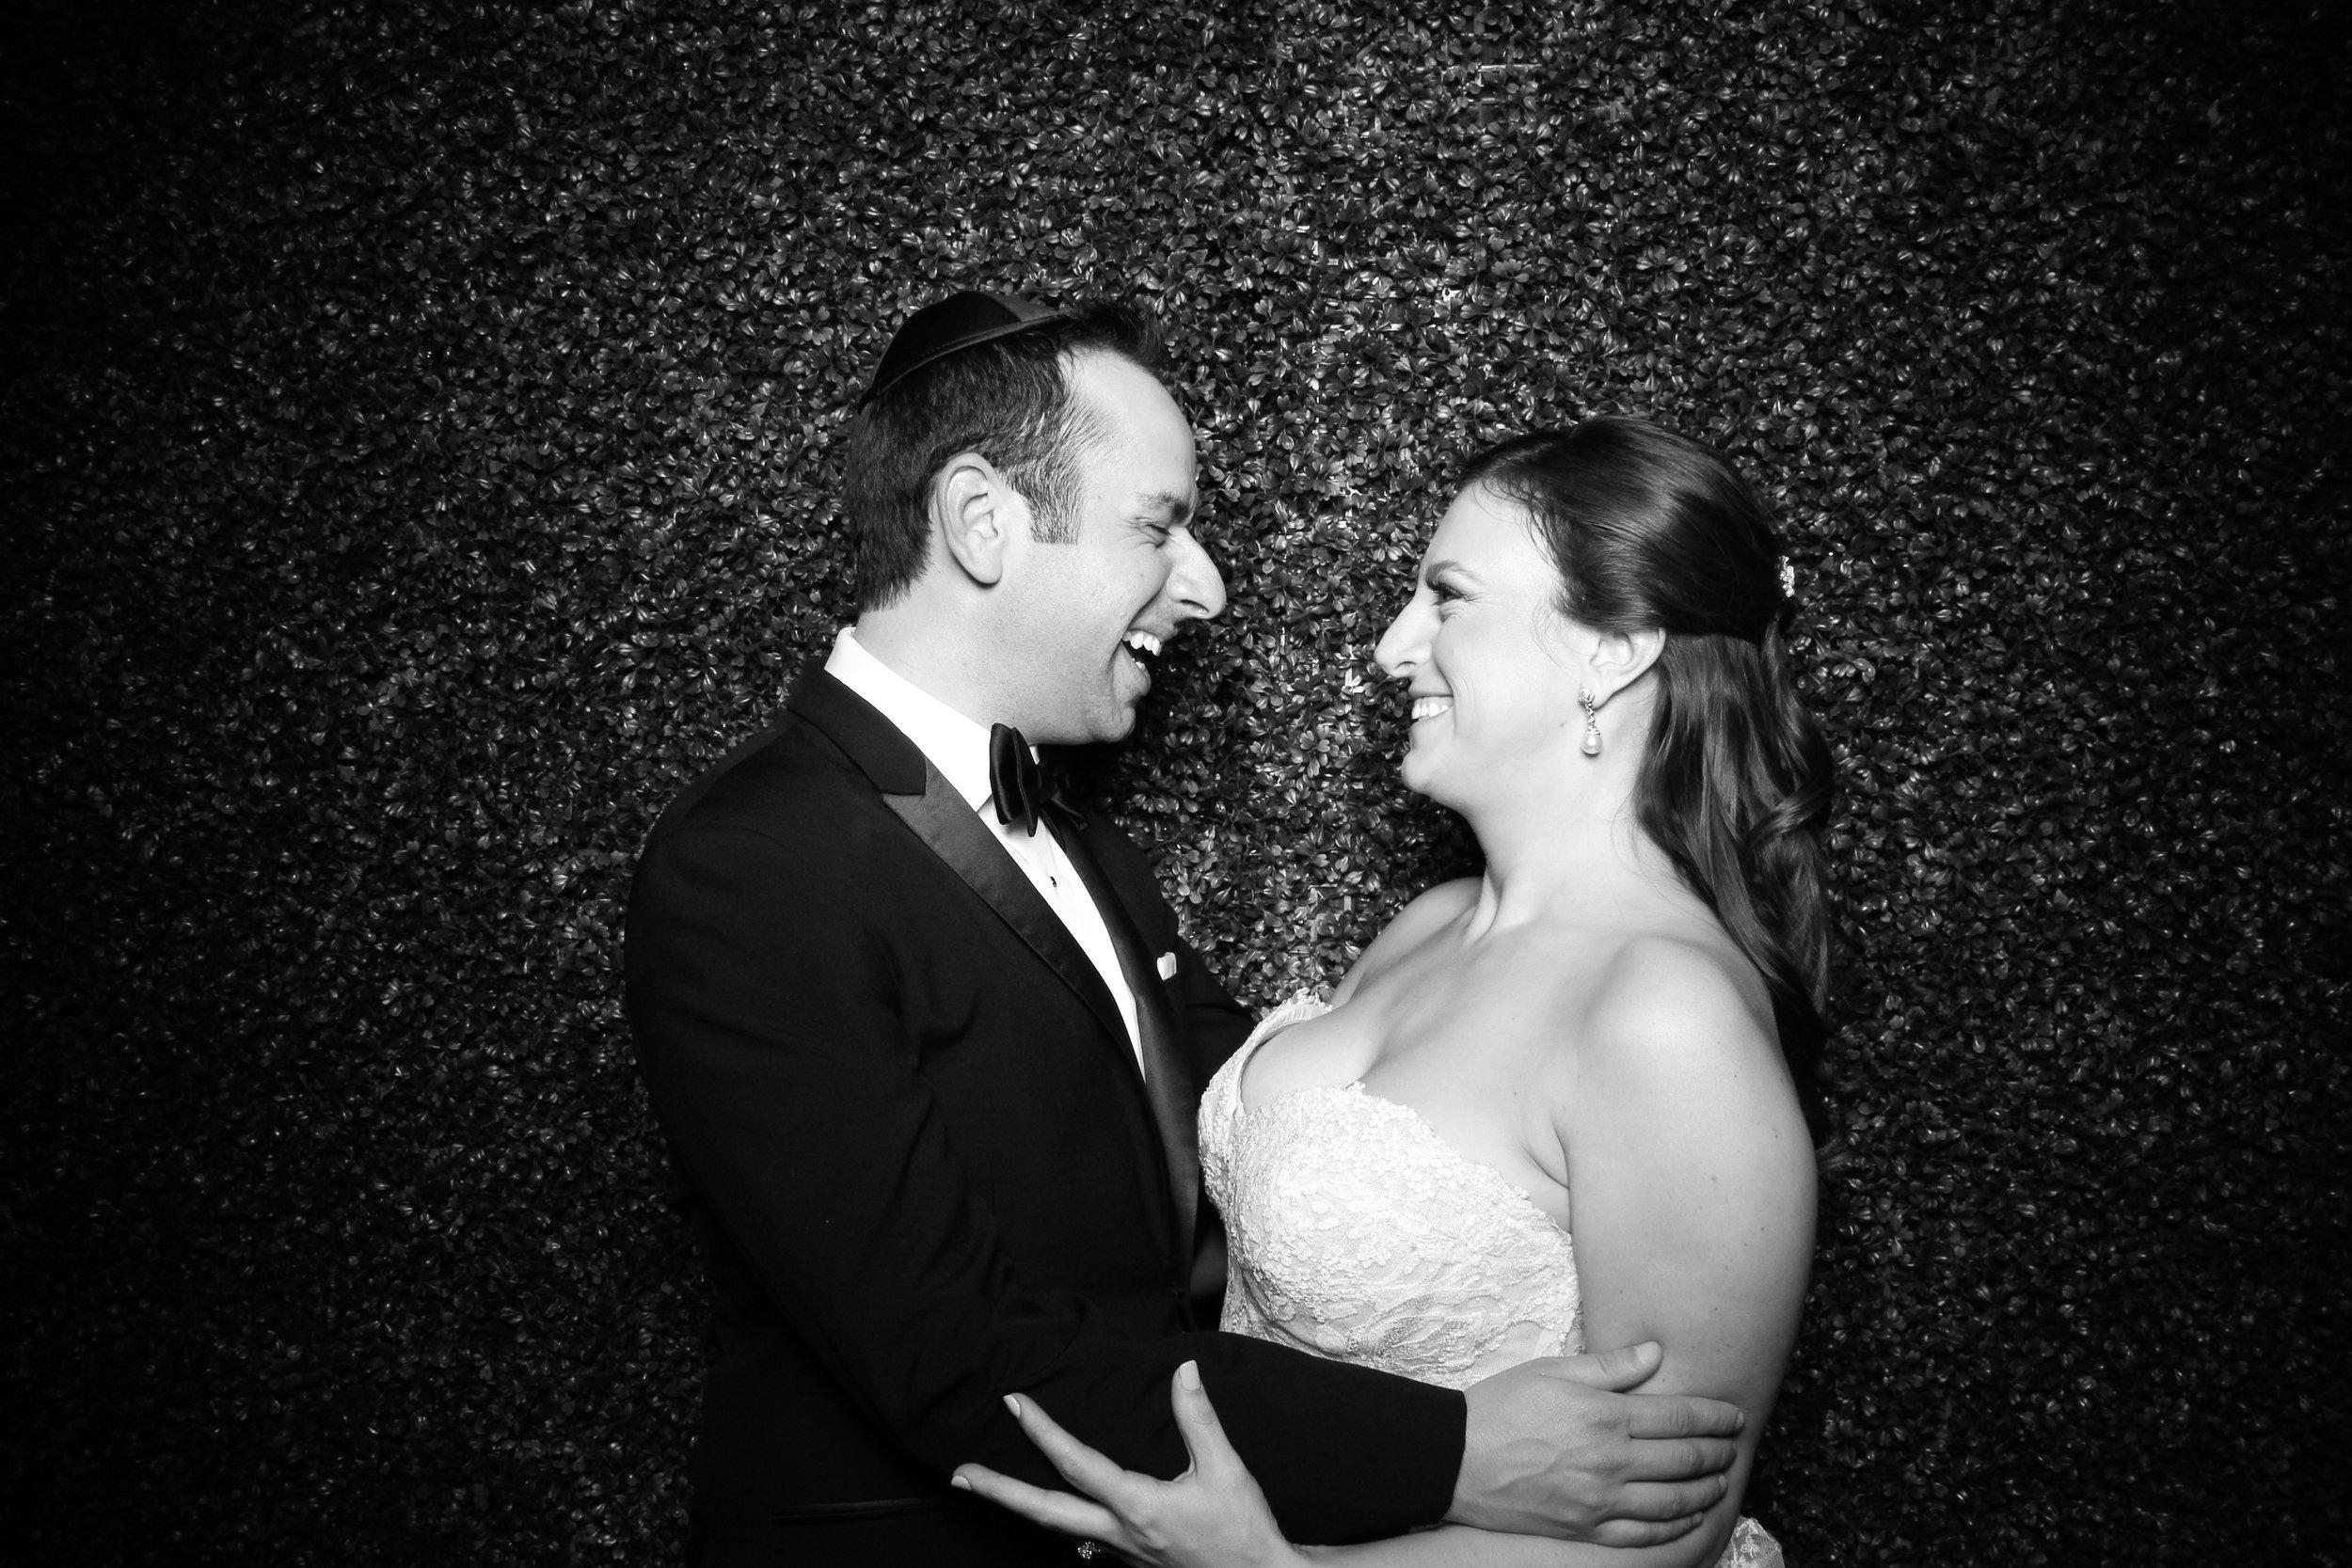 Ivy_Room_Chicago_Wedding_Reception_Photo_Booth_Rental__02.jpg